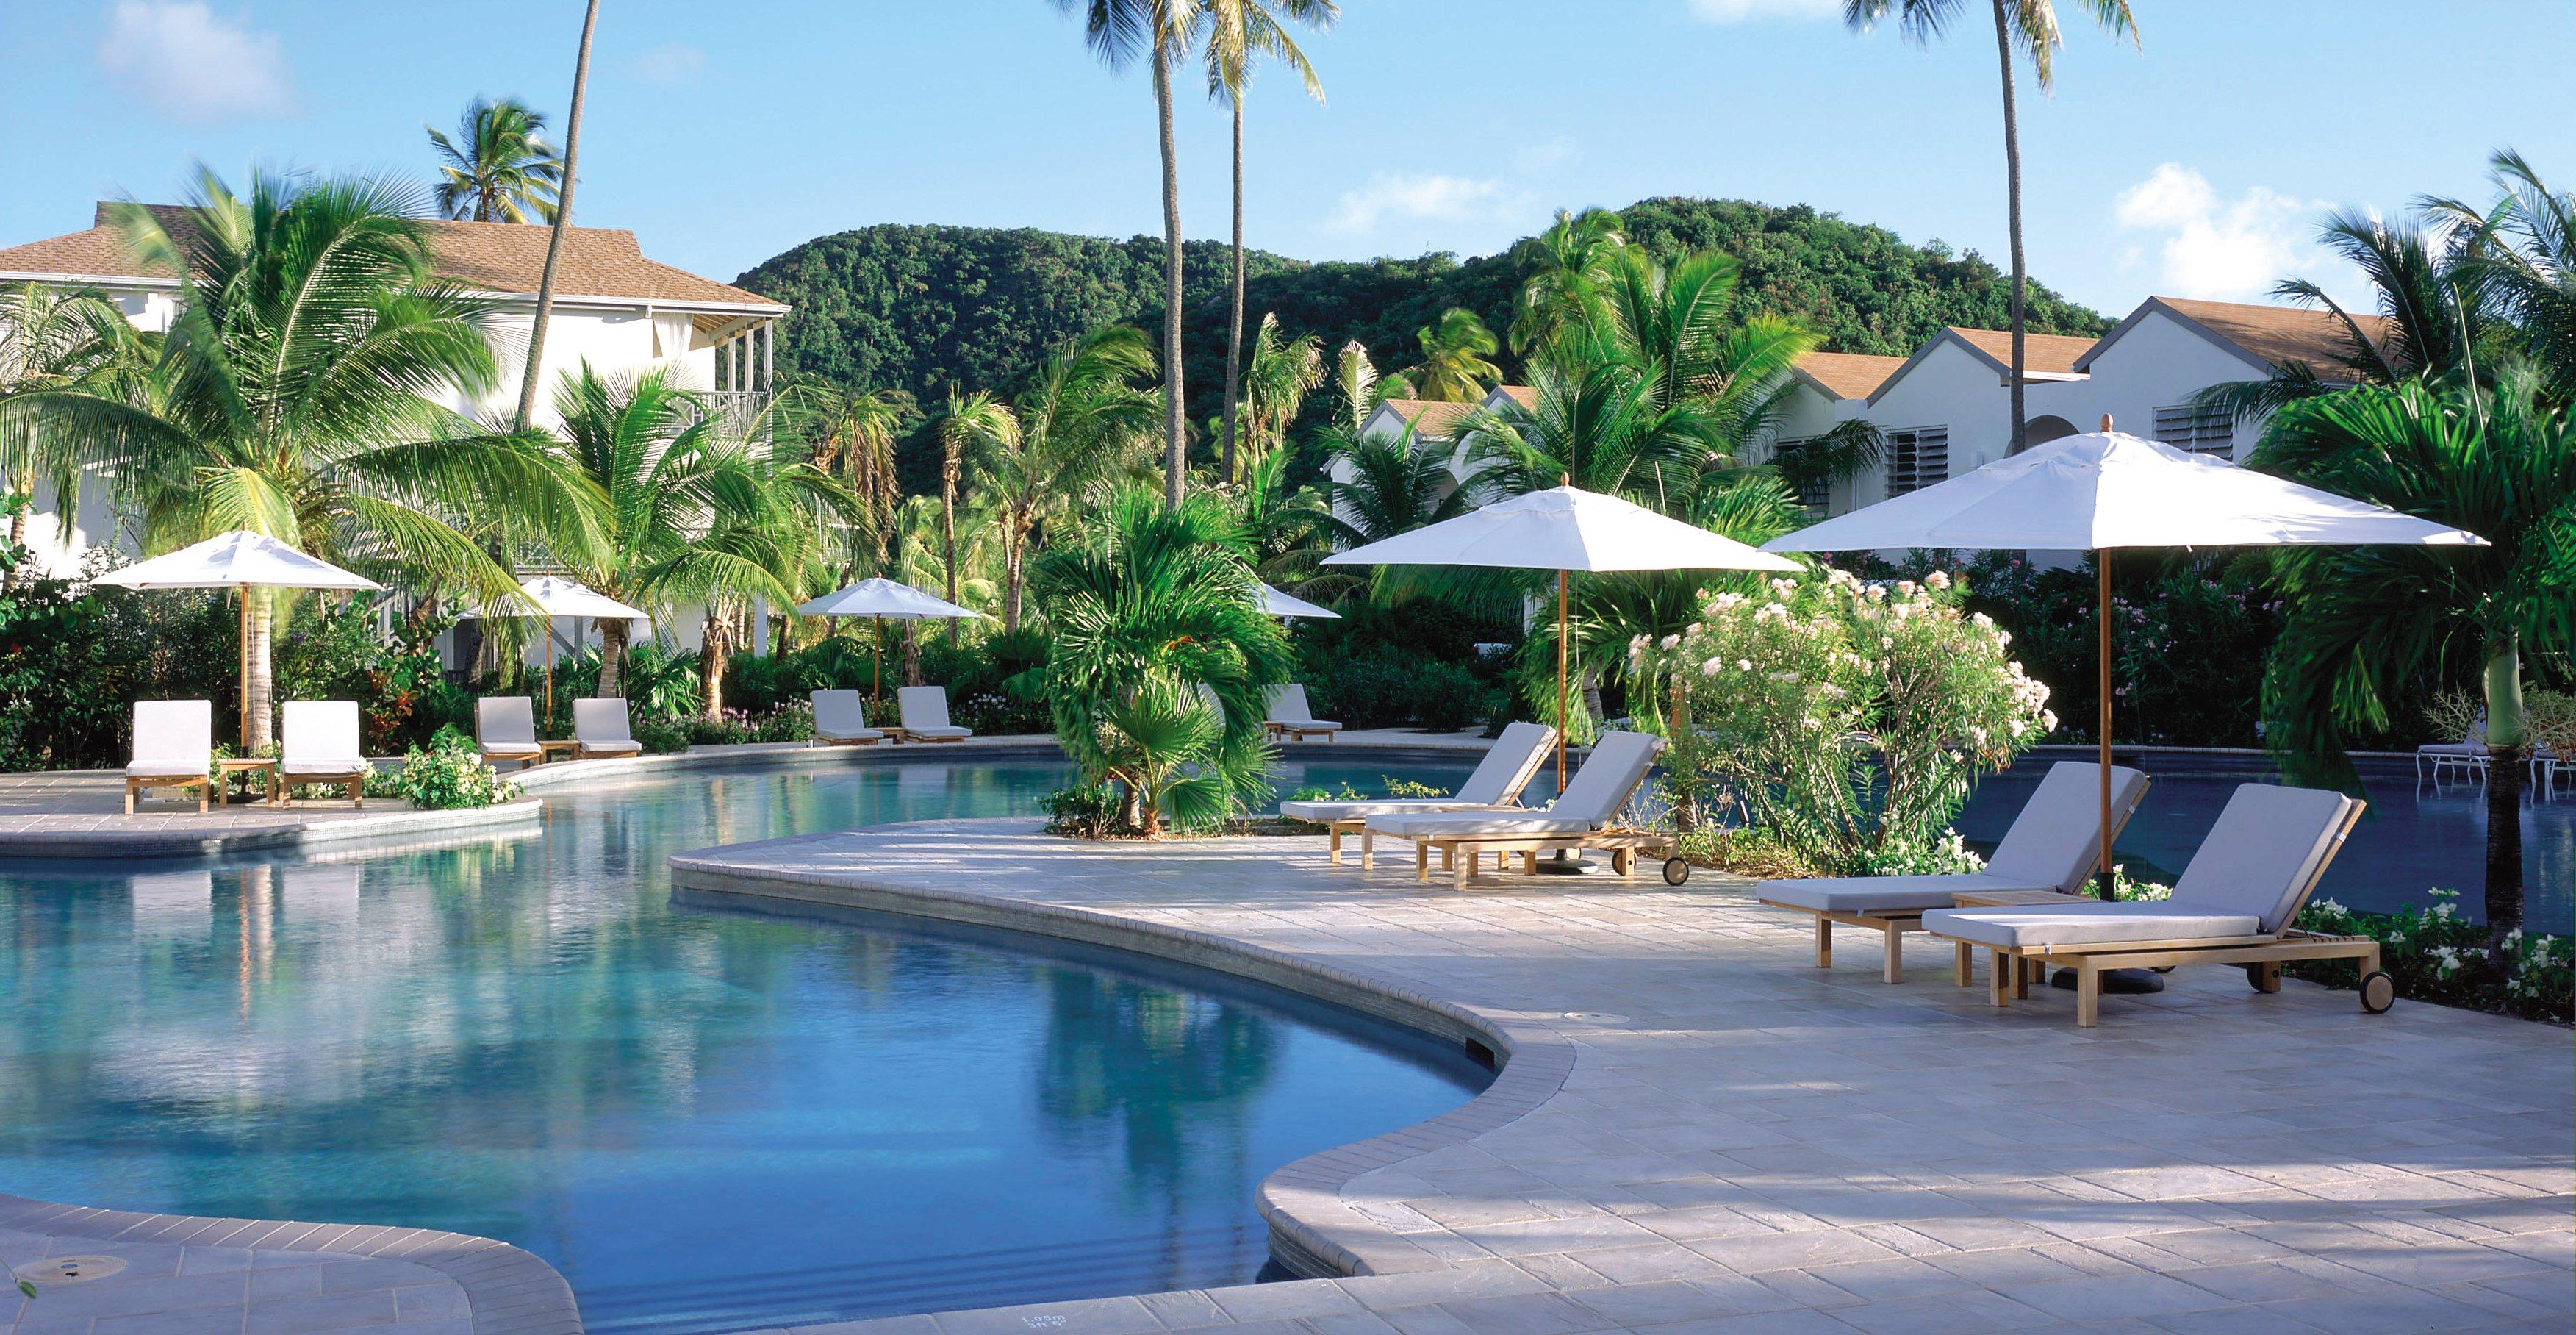 carlisle-bay-antigua-swimming-pool